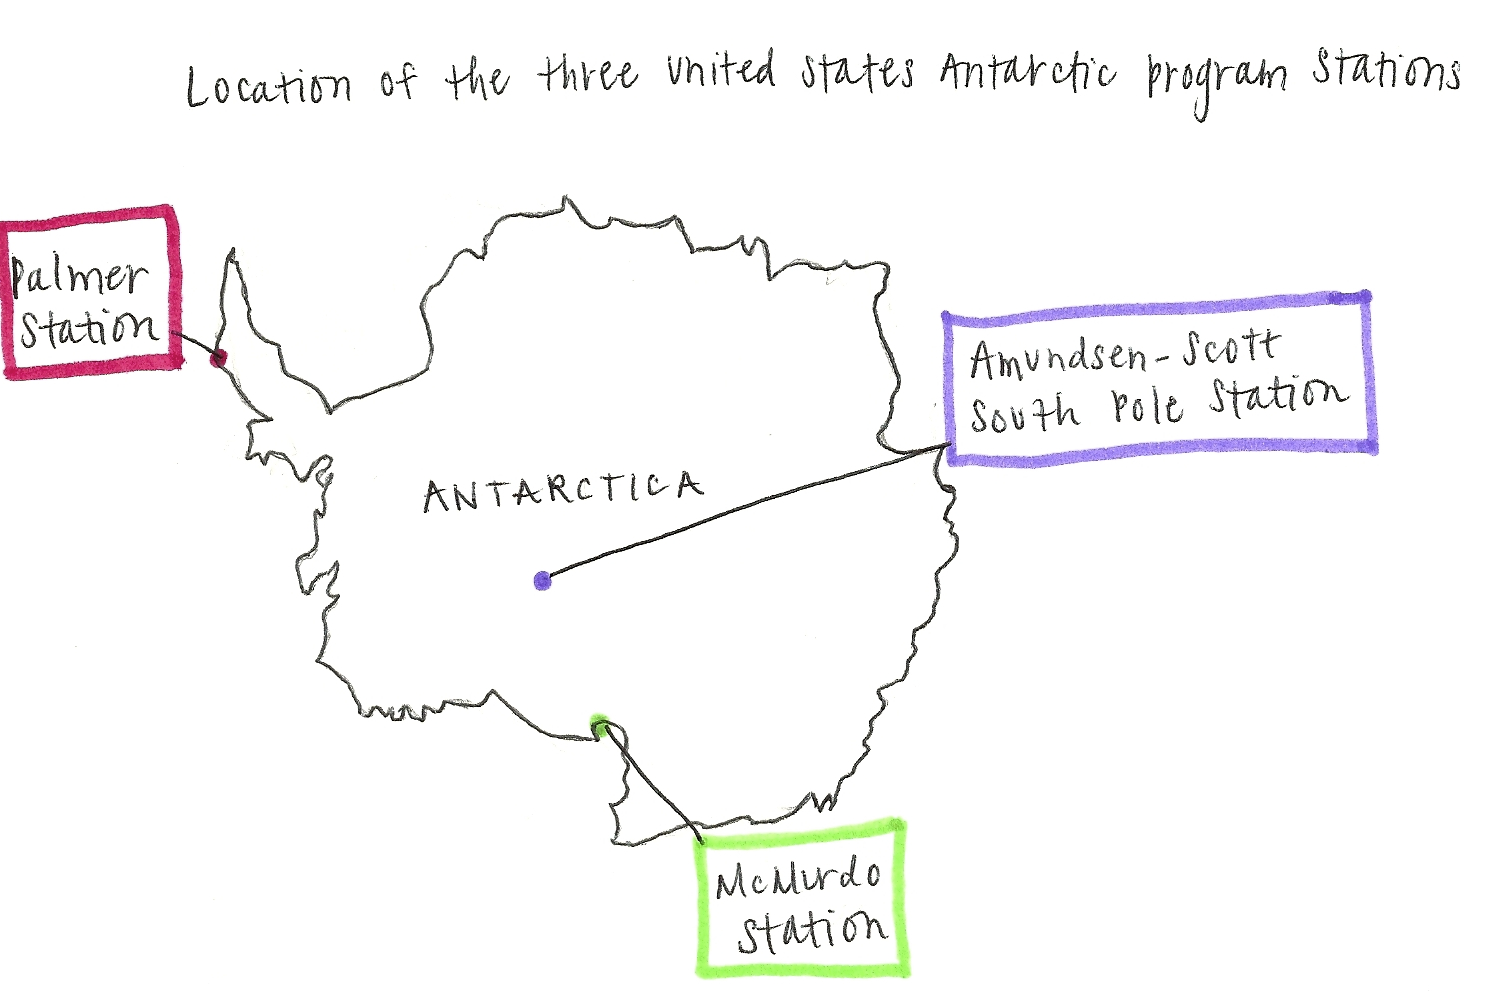 i united states antarctic program last modified november 18 2010 wikipedia http en wikipedia org wiki united states antarctic program